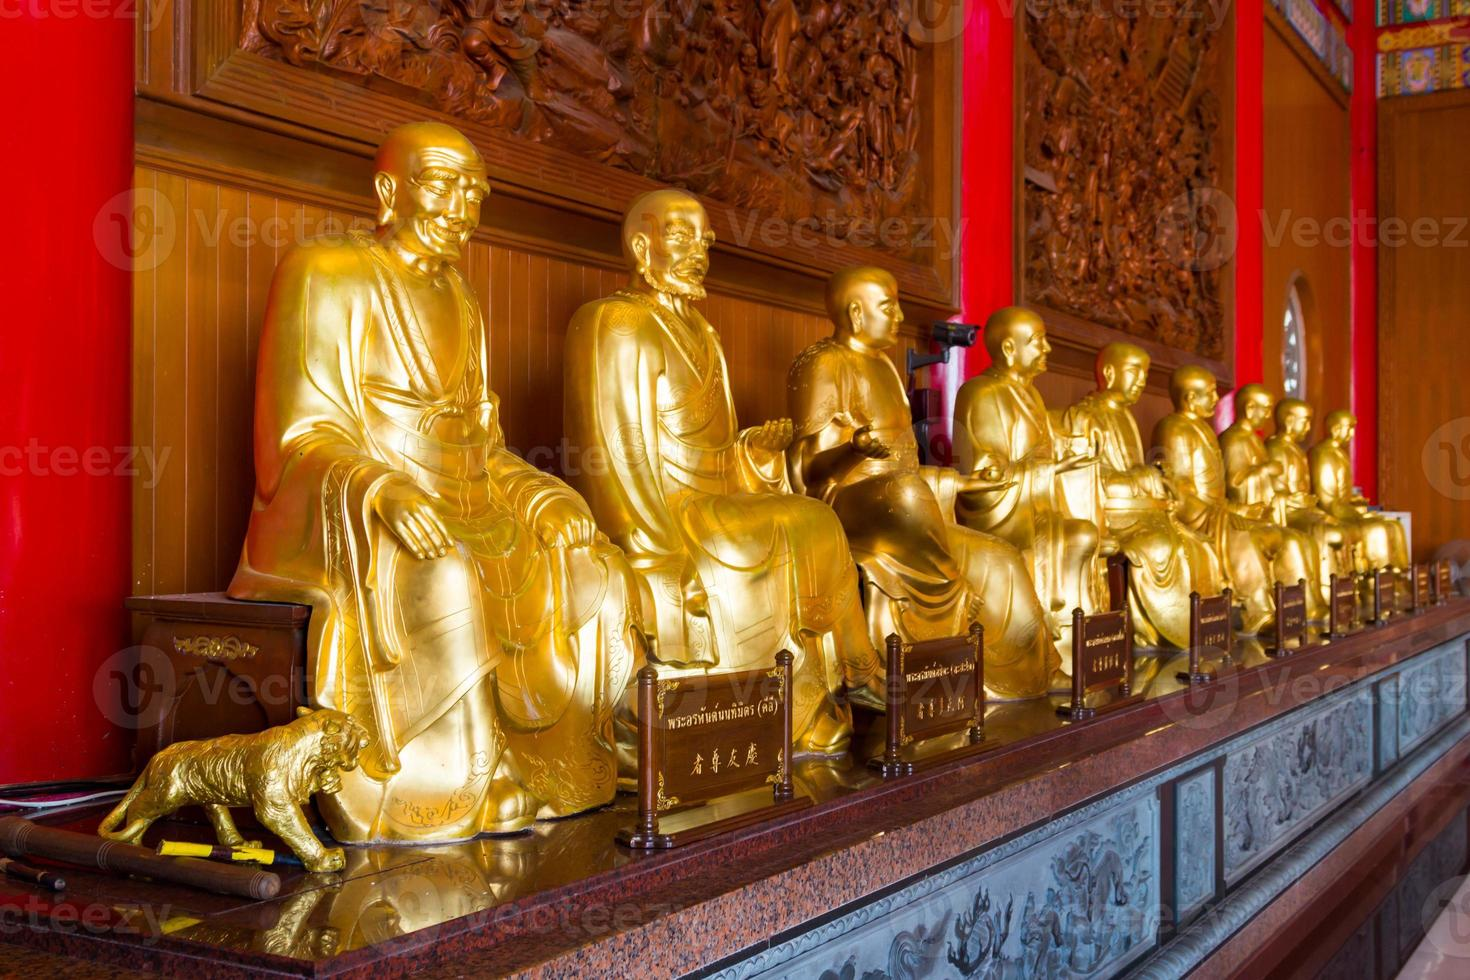 buddistiska statyer i kinesiska templet Thailand foto